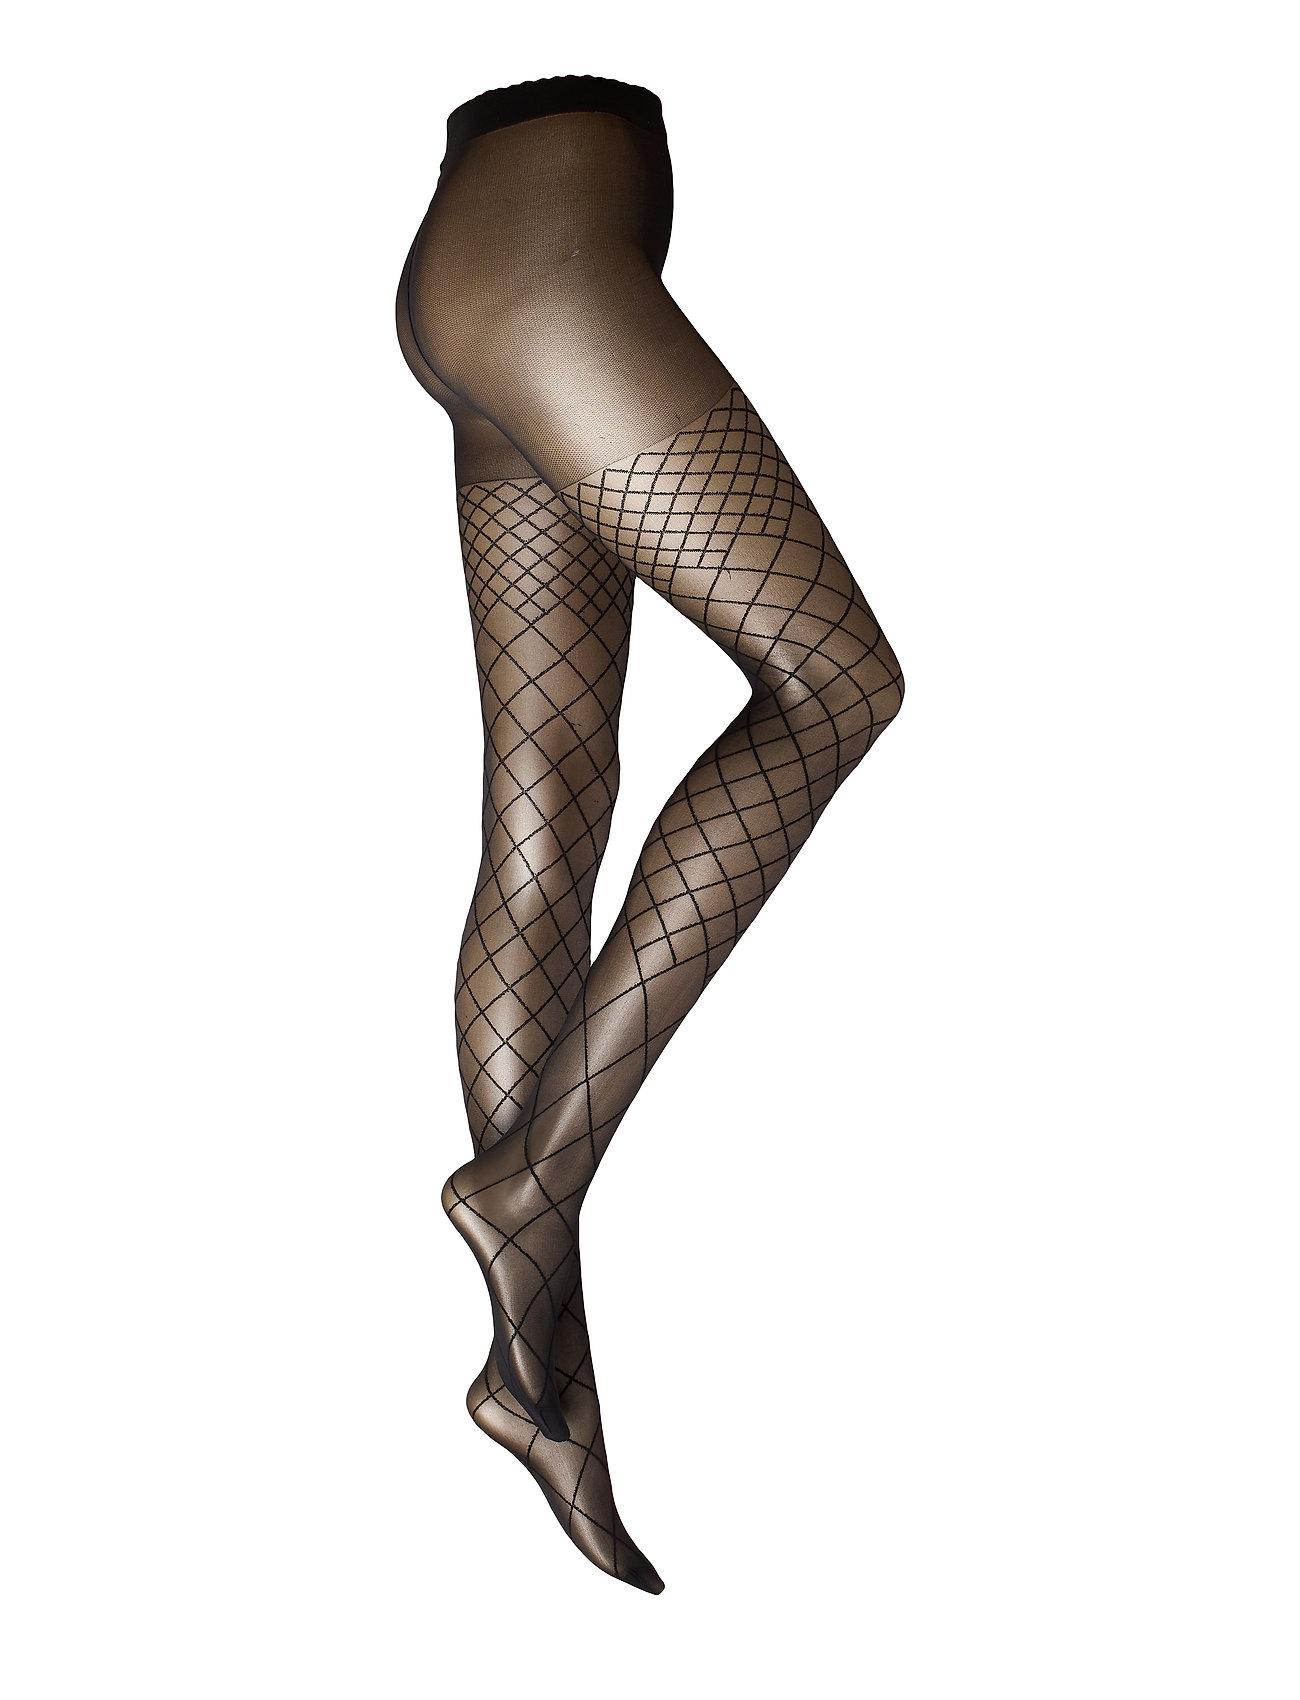 Decoy DECOY tights w/diamonds 30 den - BLACK